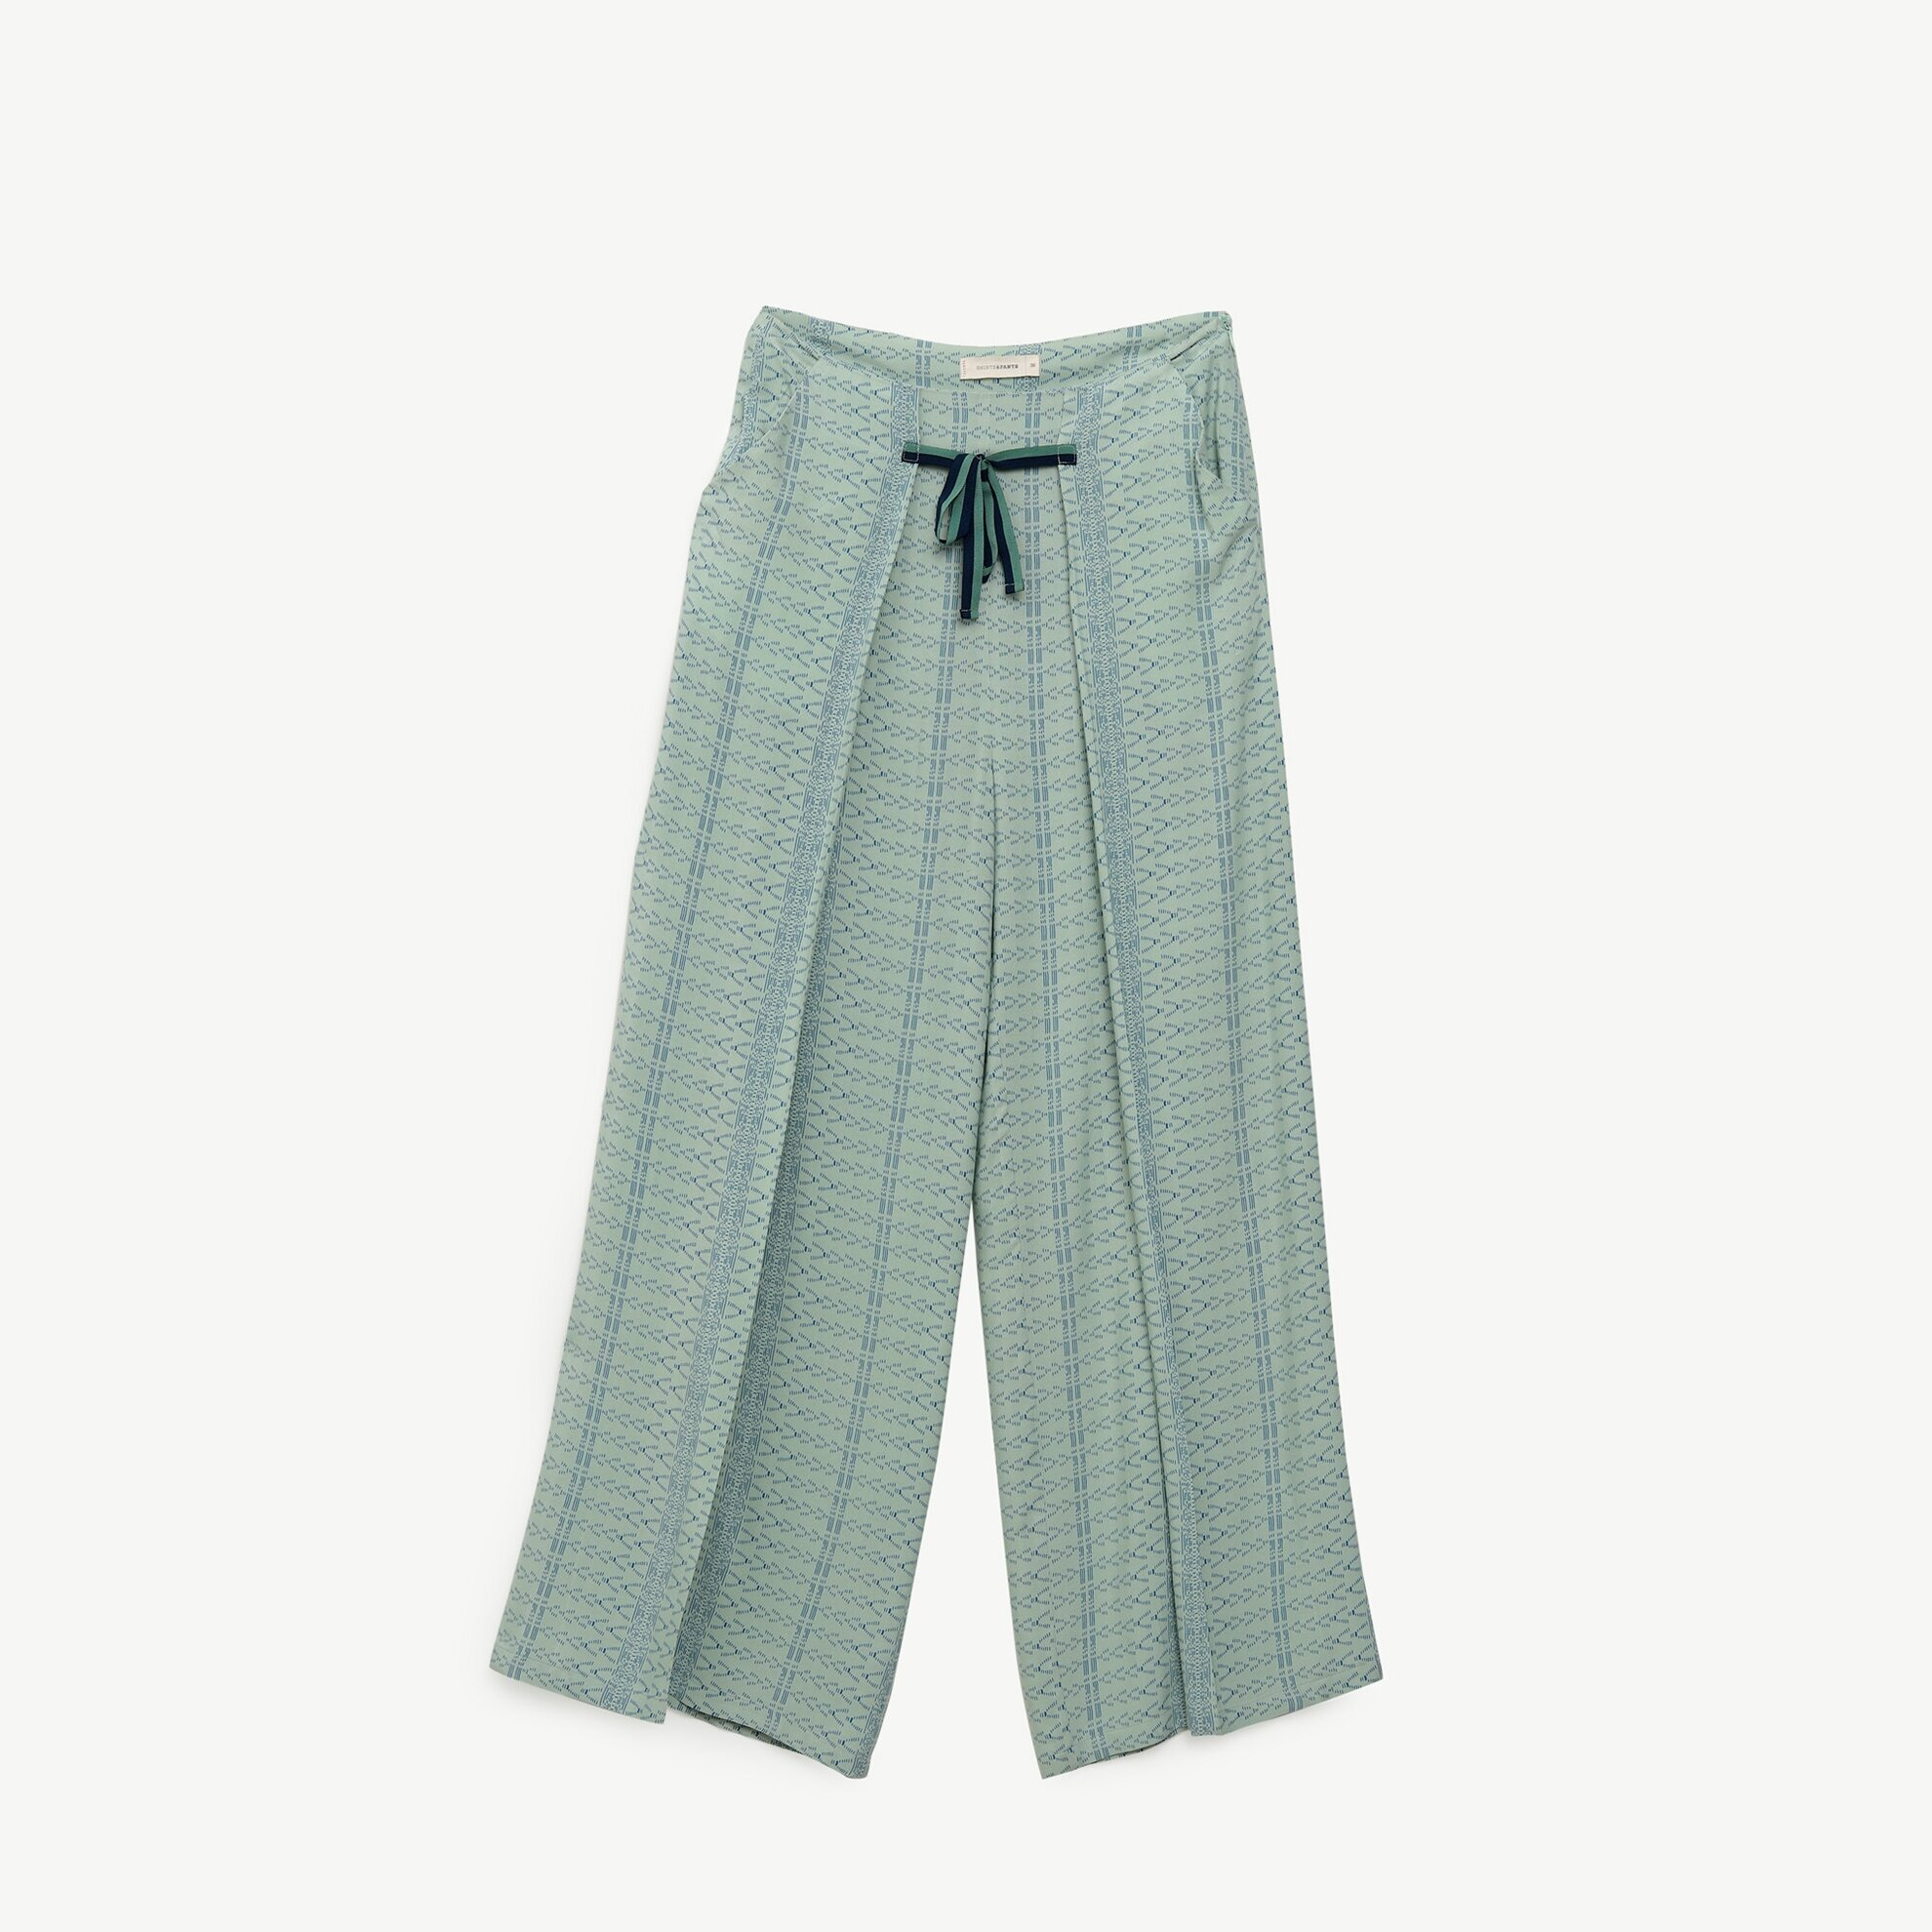 Bağlama Detaylı Pantolon